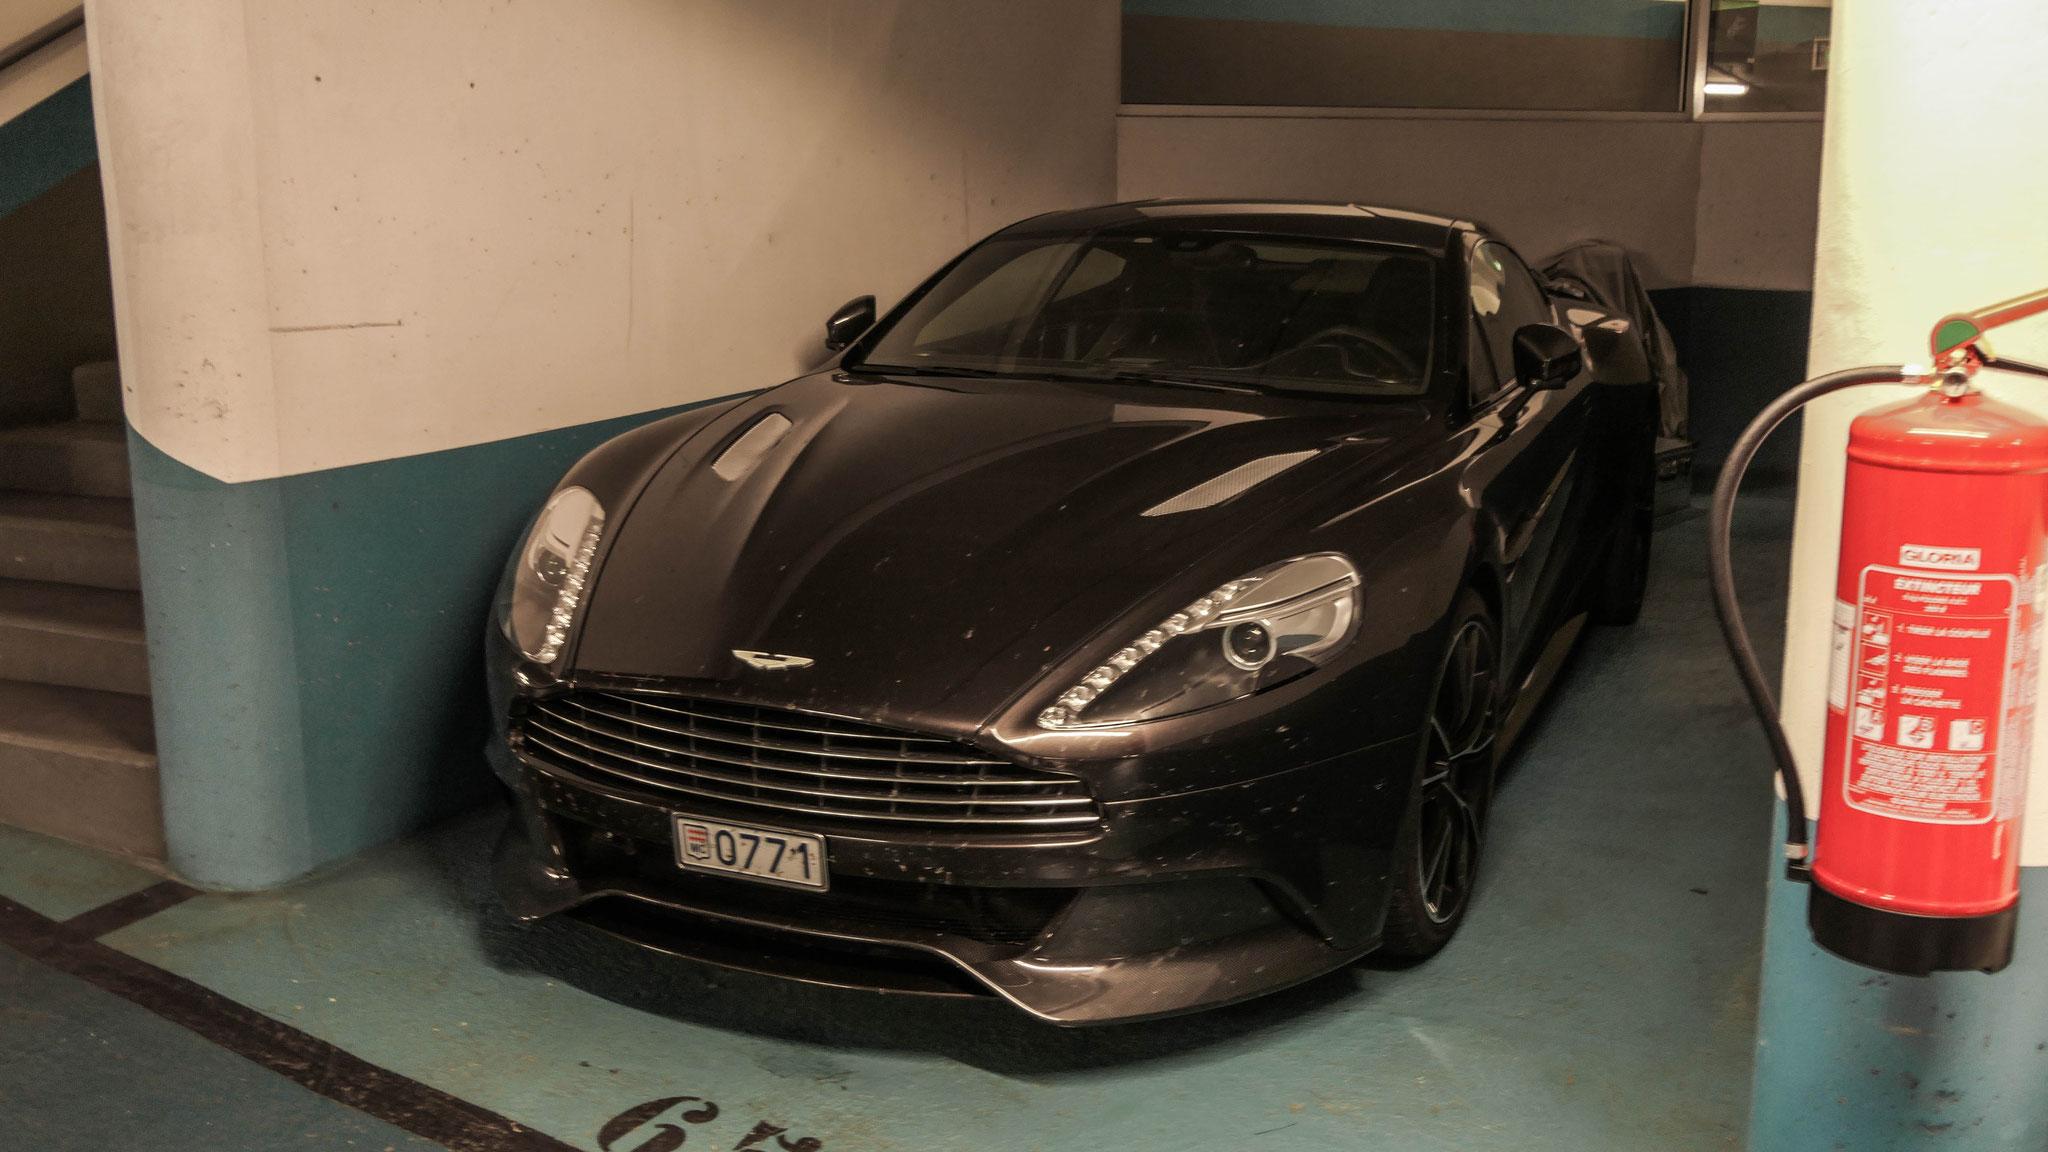 Aston Martin Vanquish - 0771 (MC)